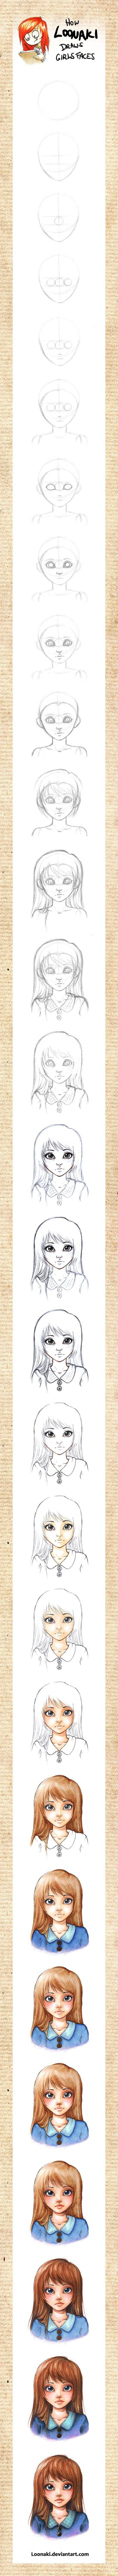 How Loonaki Draws Girls Faces by Loonaki on deviantART